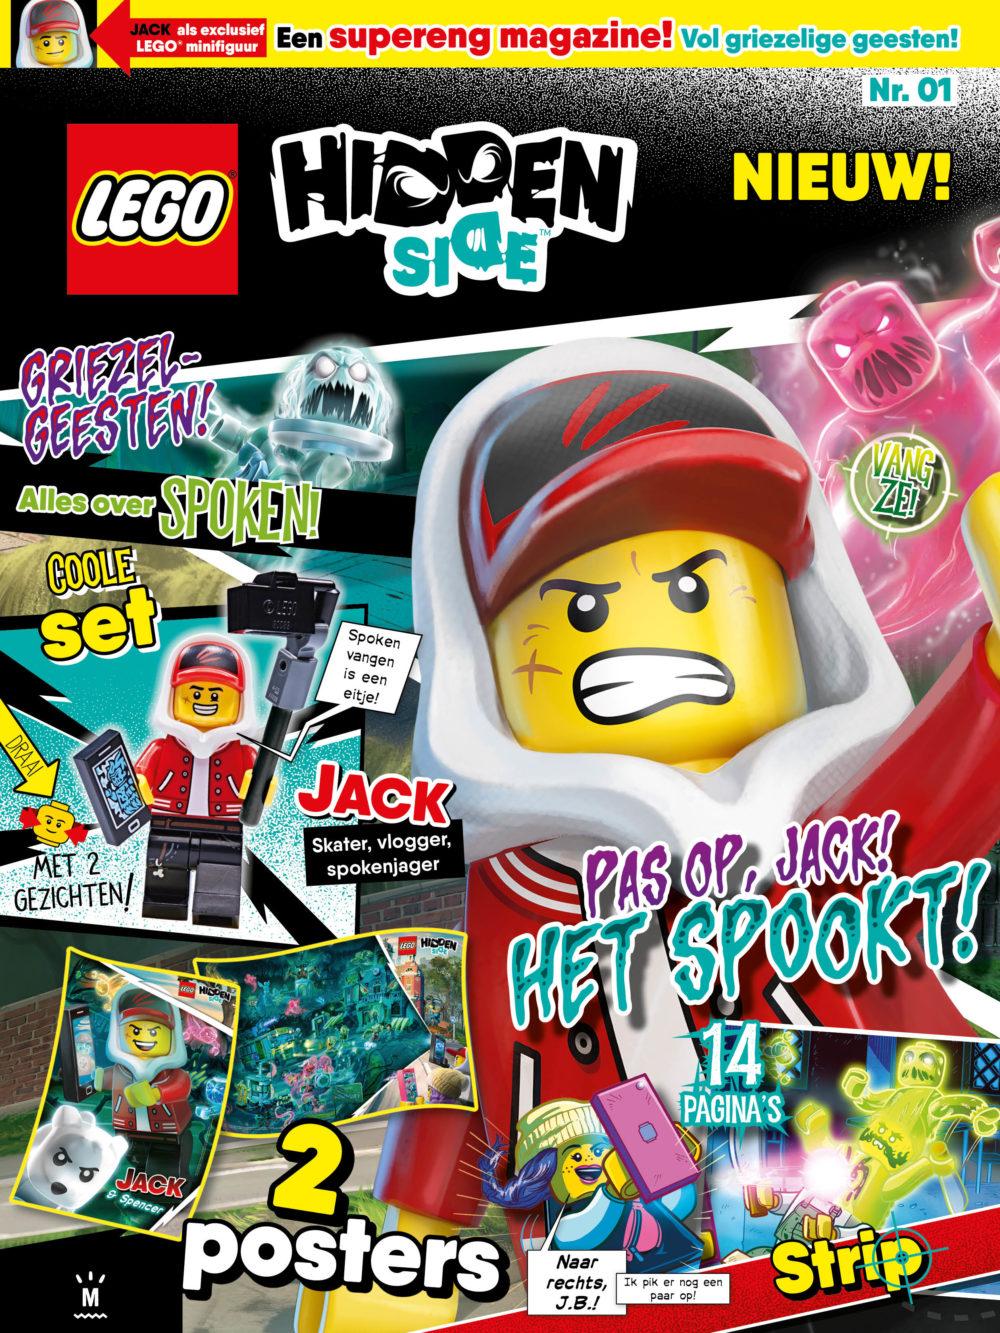 LEGO HiddenSide_01_2019 (1)